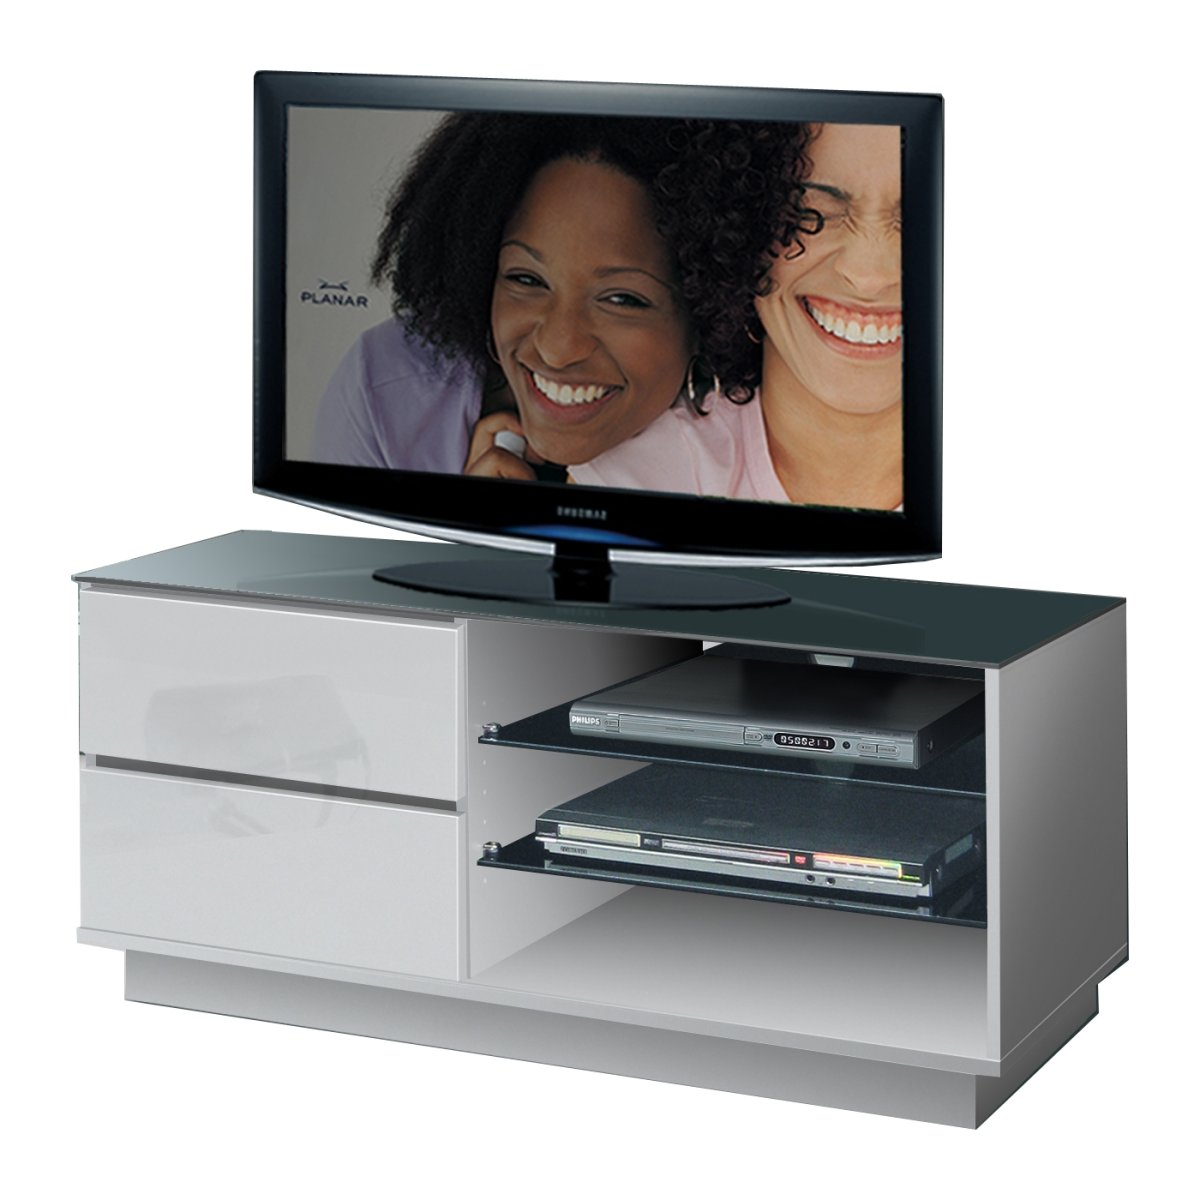 white tv stand black glass shelves drawers 32 42 ebay. Black Bedroom Furniture Sets. Home Design Ideas